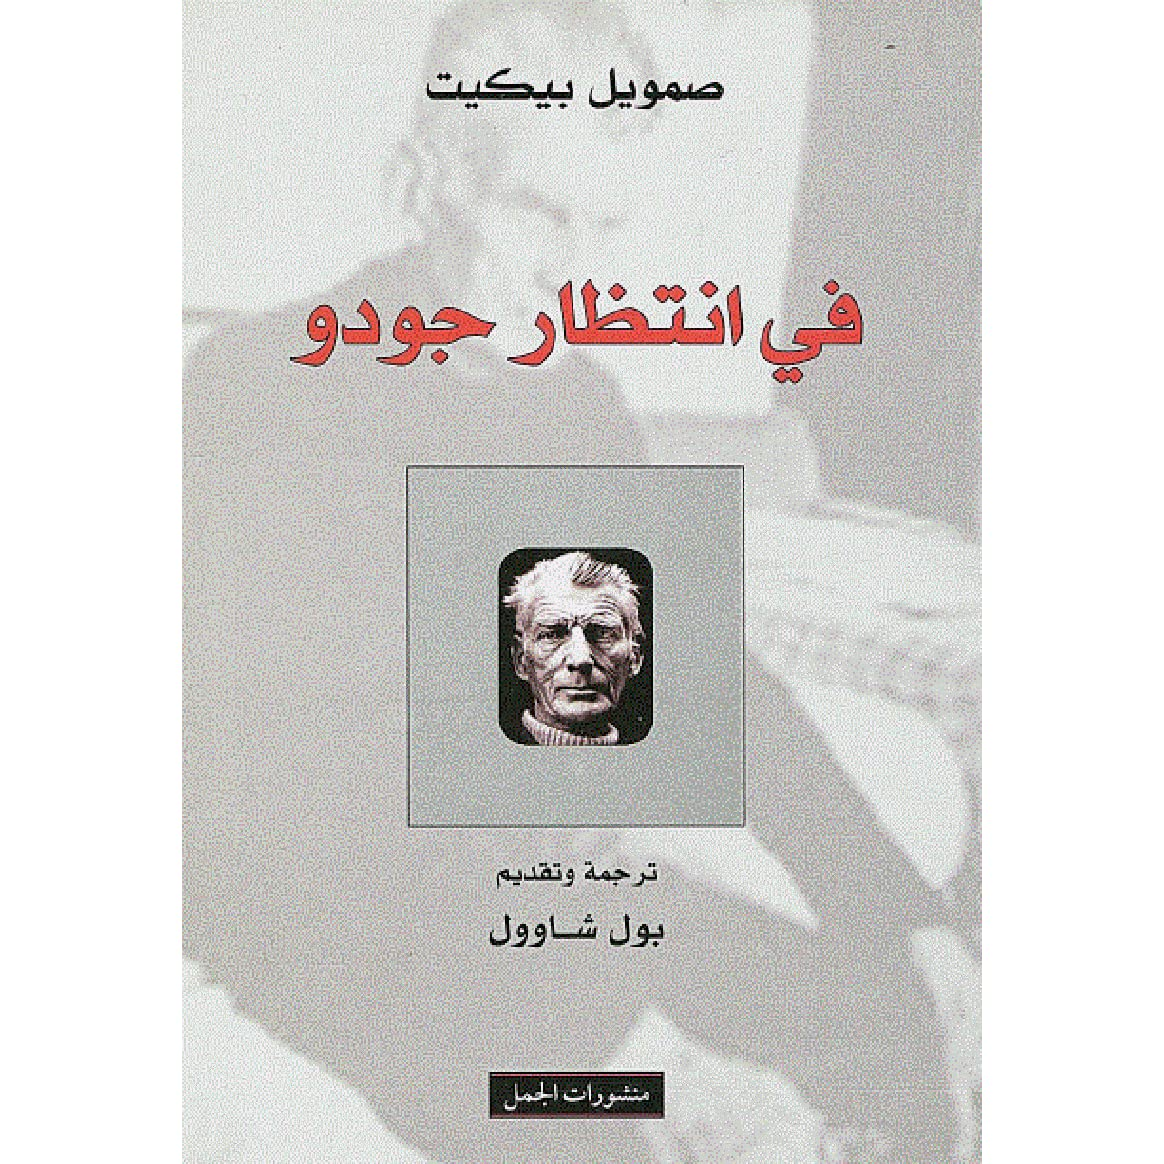 Photo of تحميل كتاب في انتظار جودو PDF مجانا